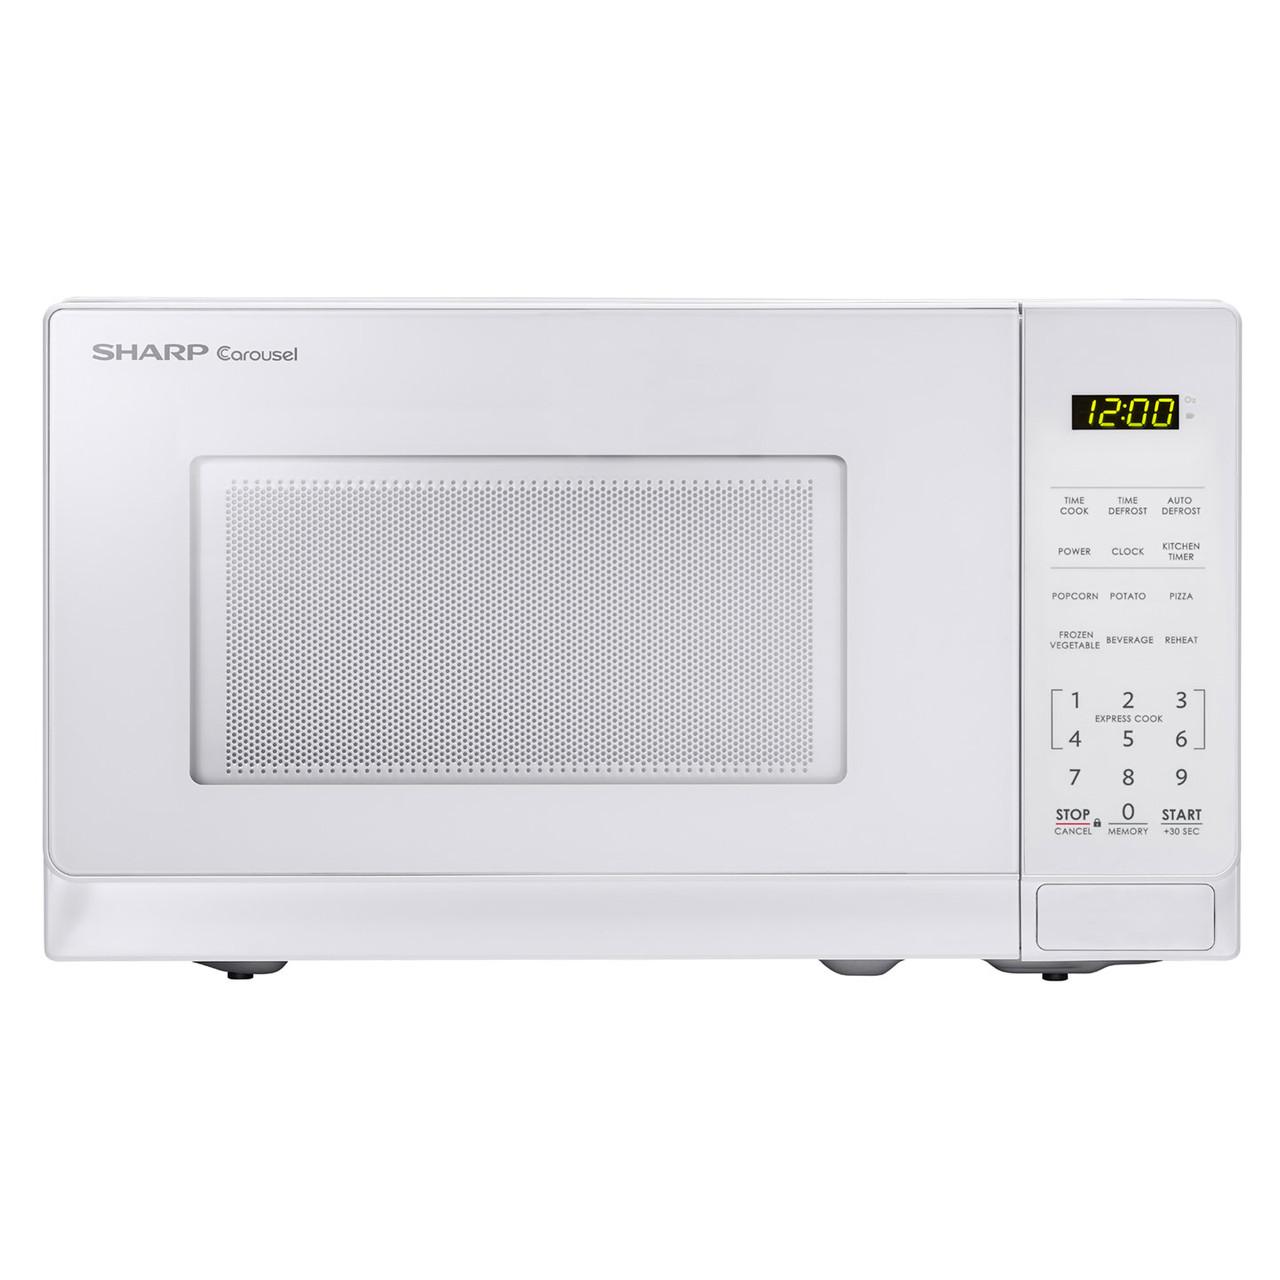 0.7 cu. ft. Sharp White Countertop Microwave (SMC0710BW)